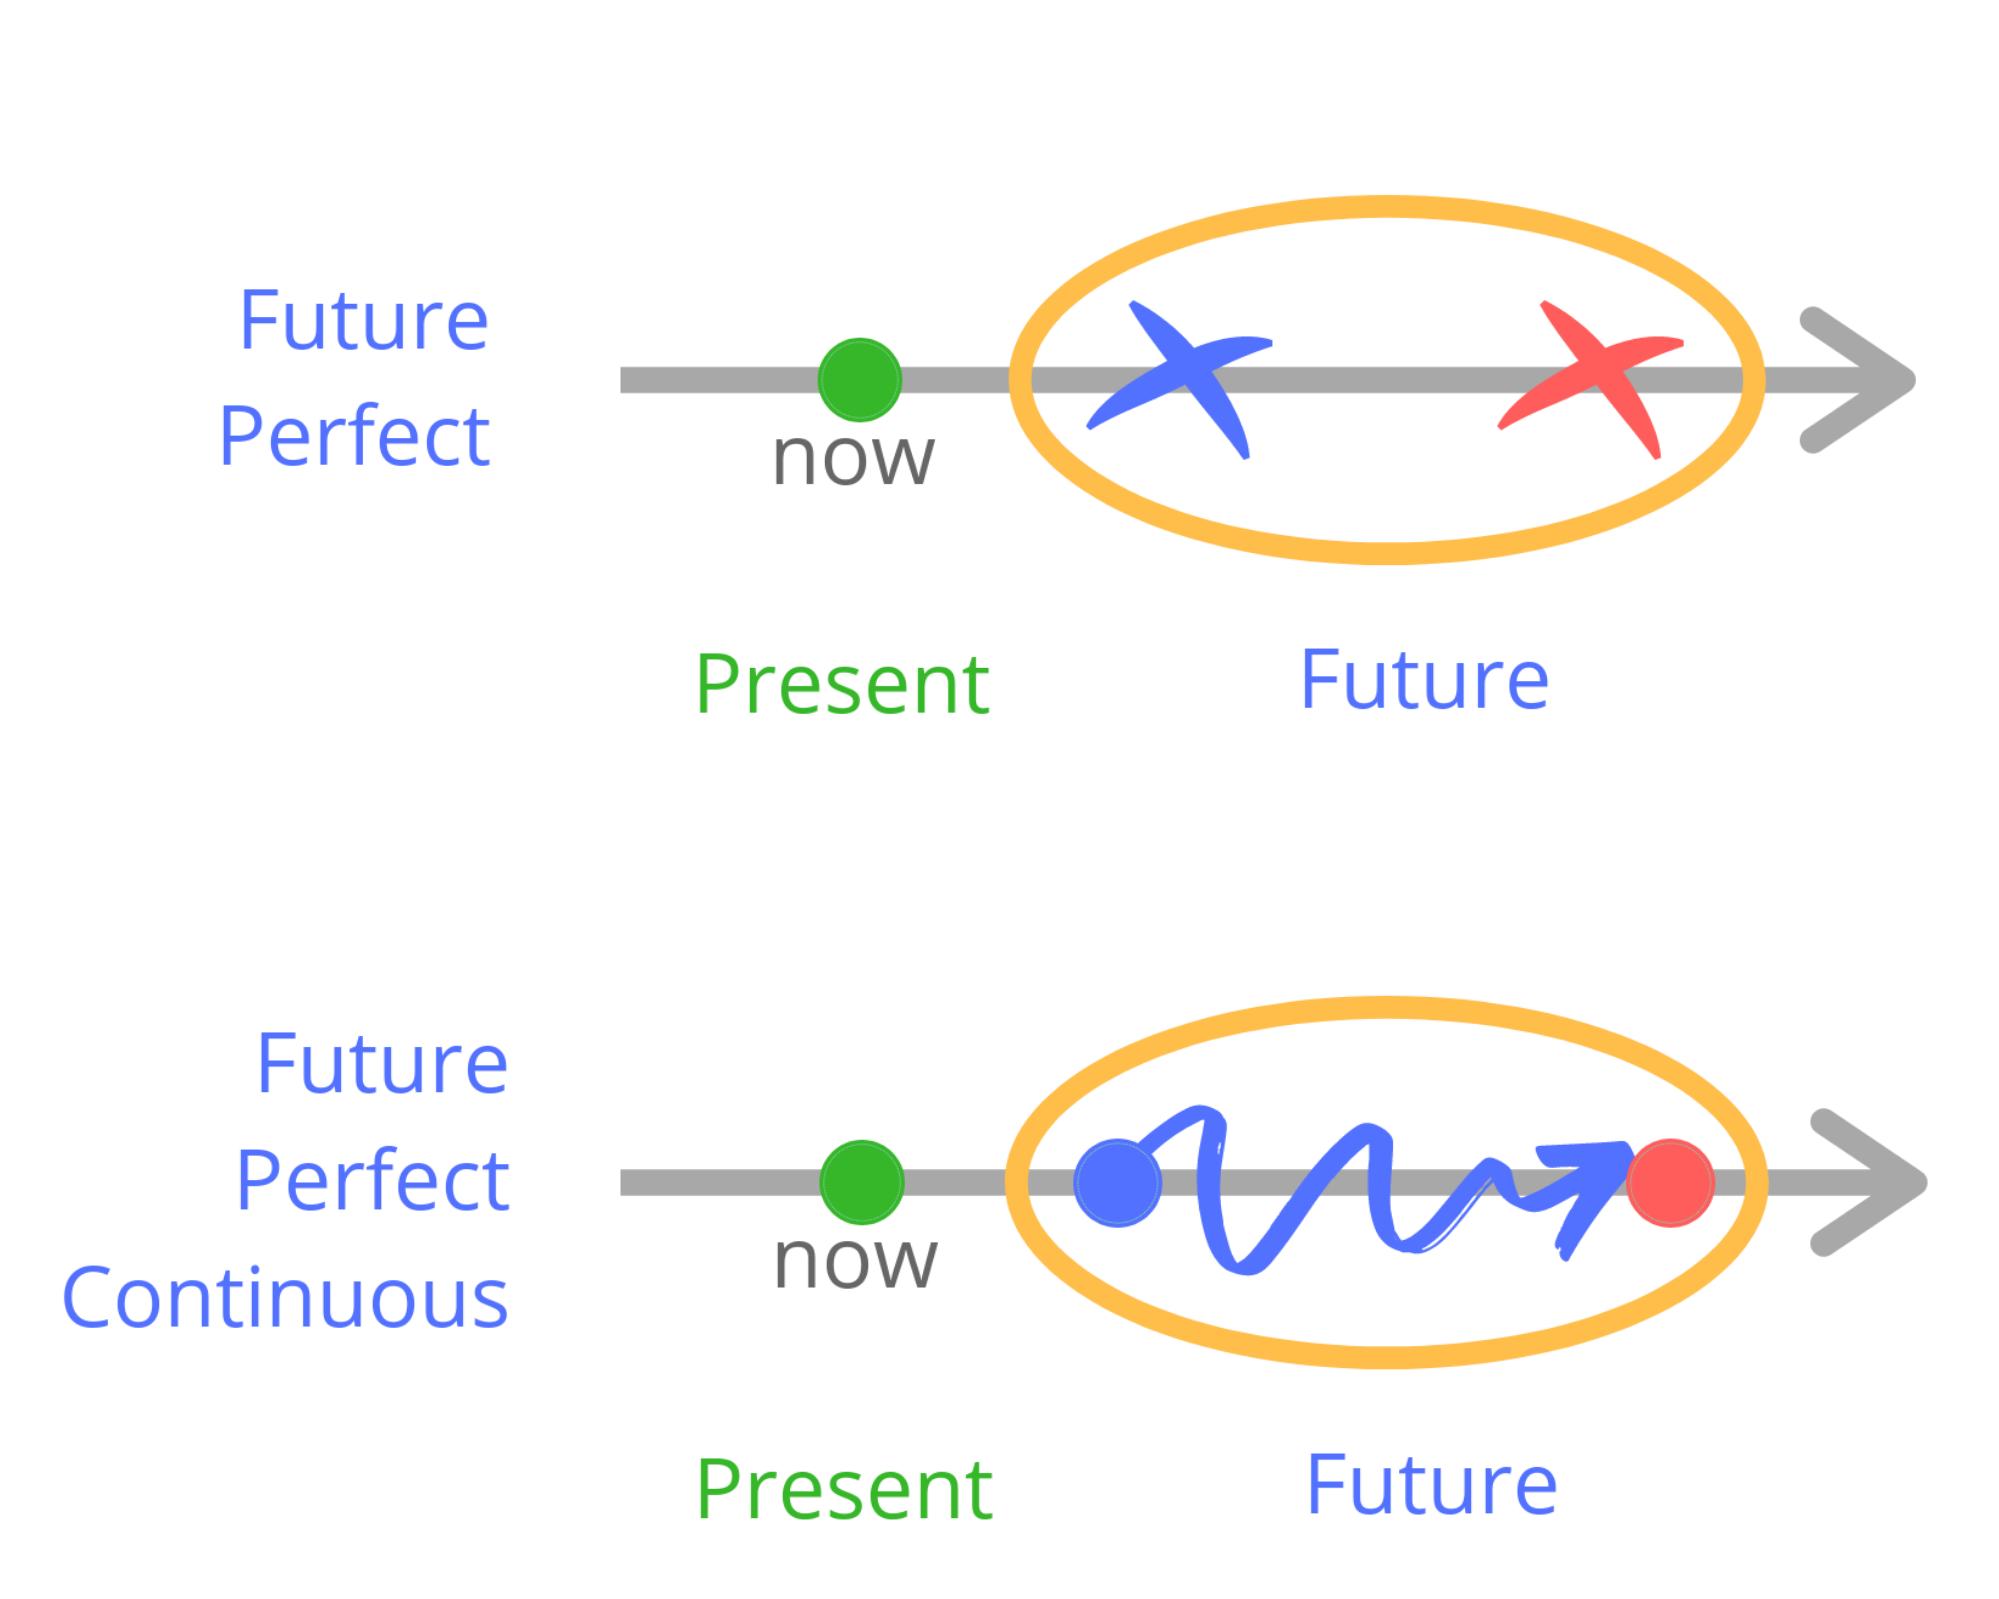 Порівняння Future Perfect і Future Perfect Continuous